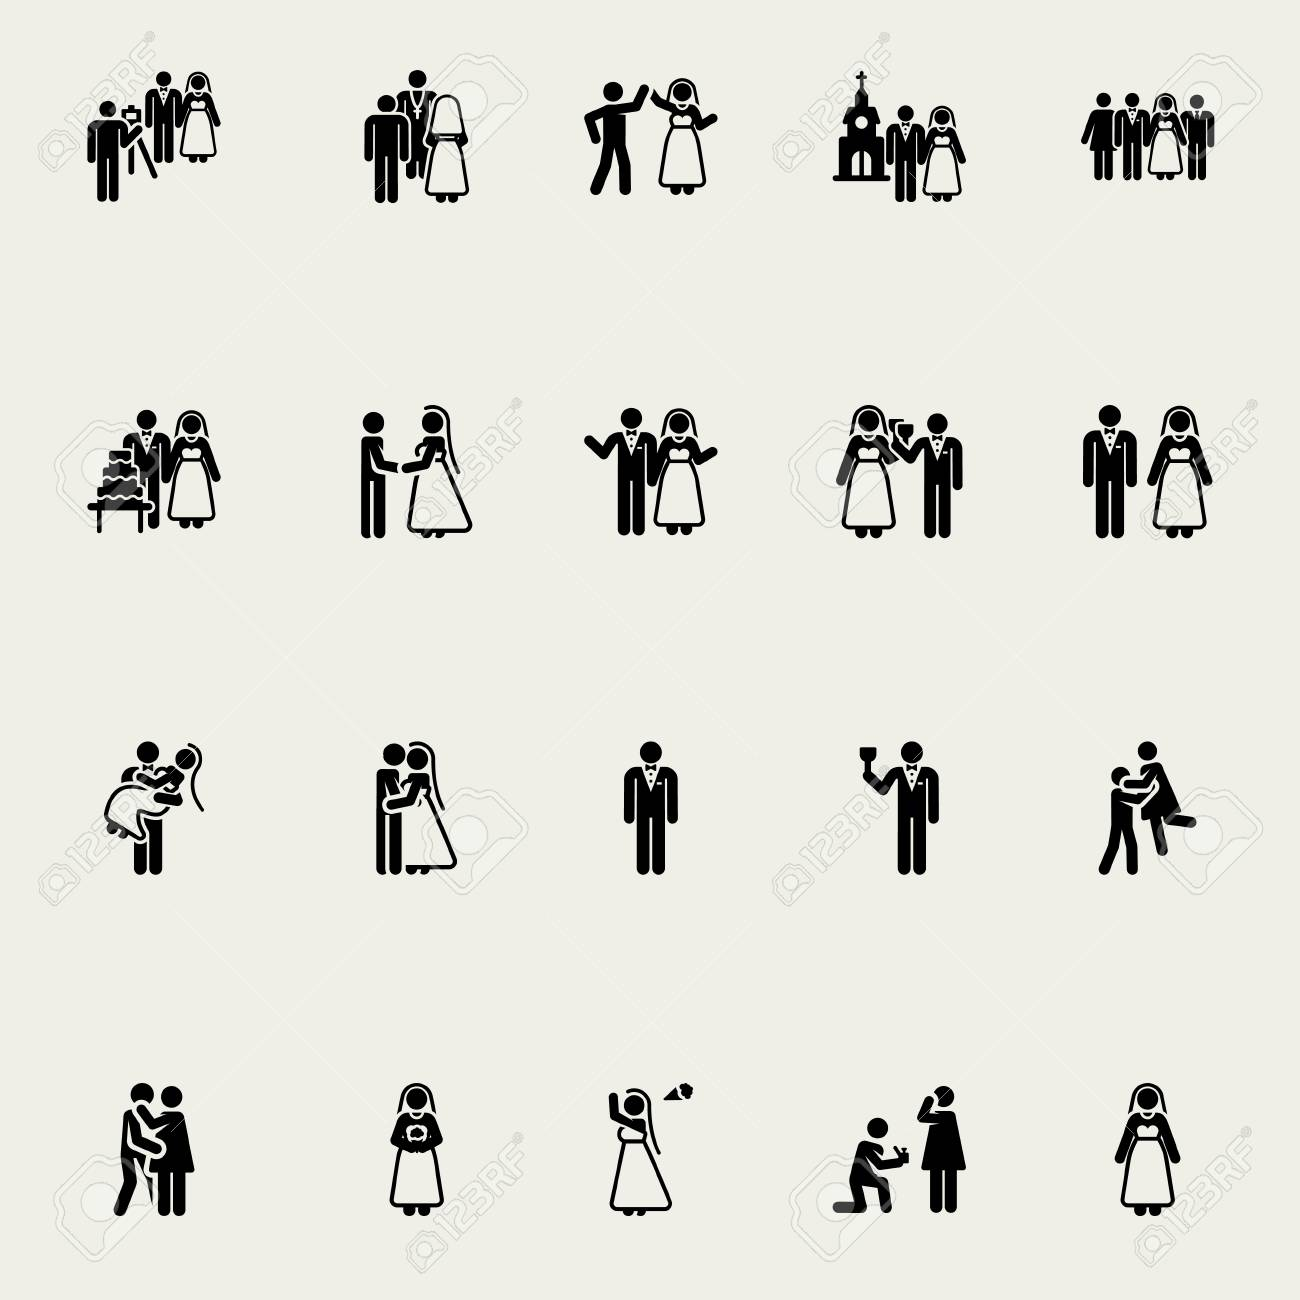 wedding stick figures vector design elements monochrome royalty